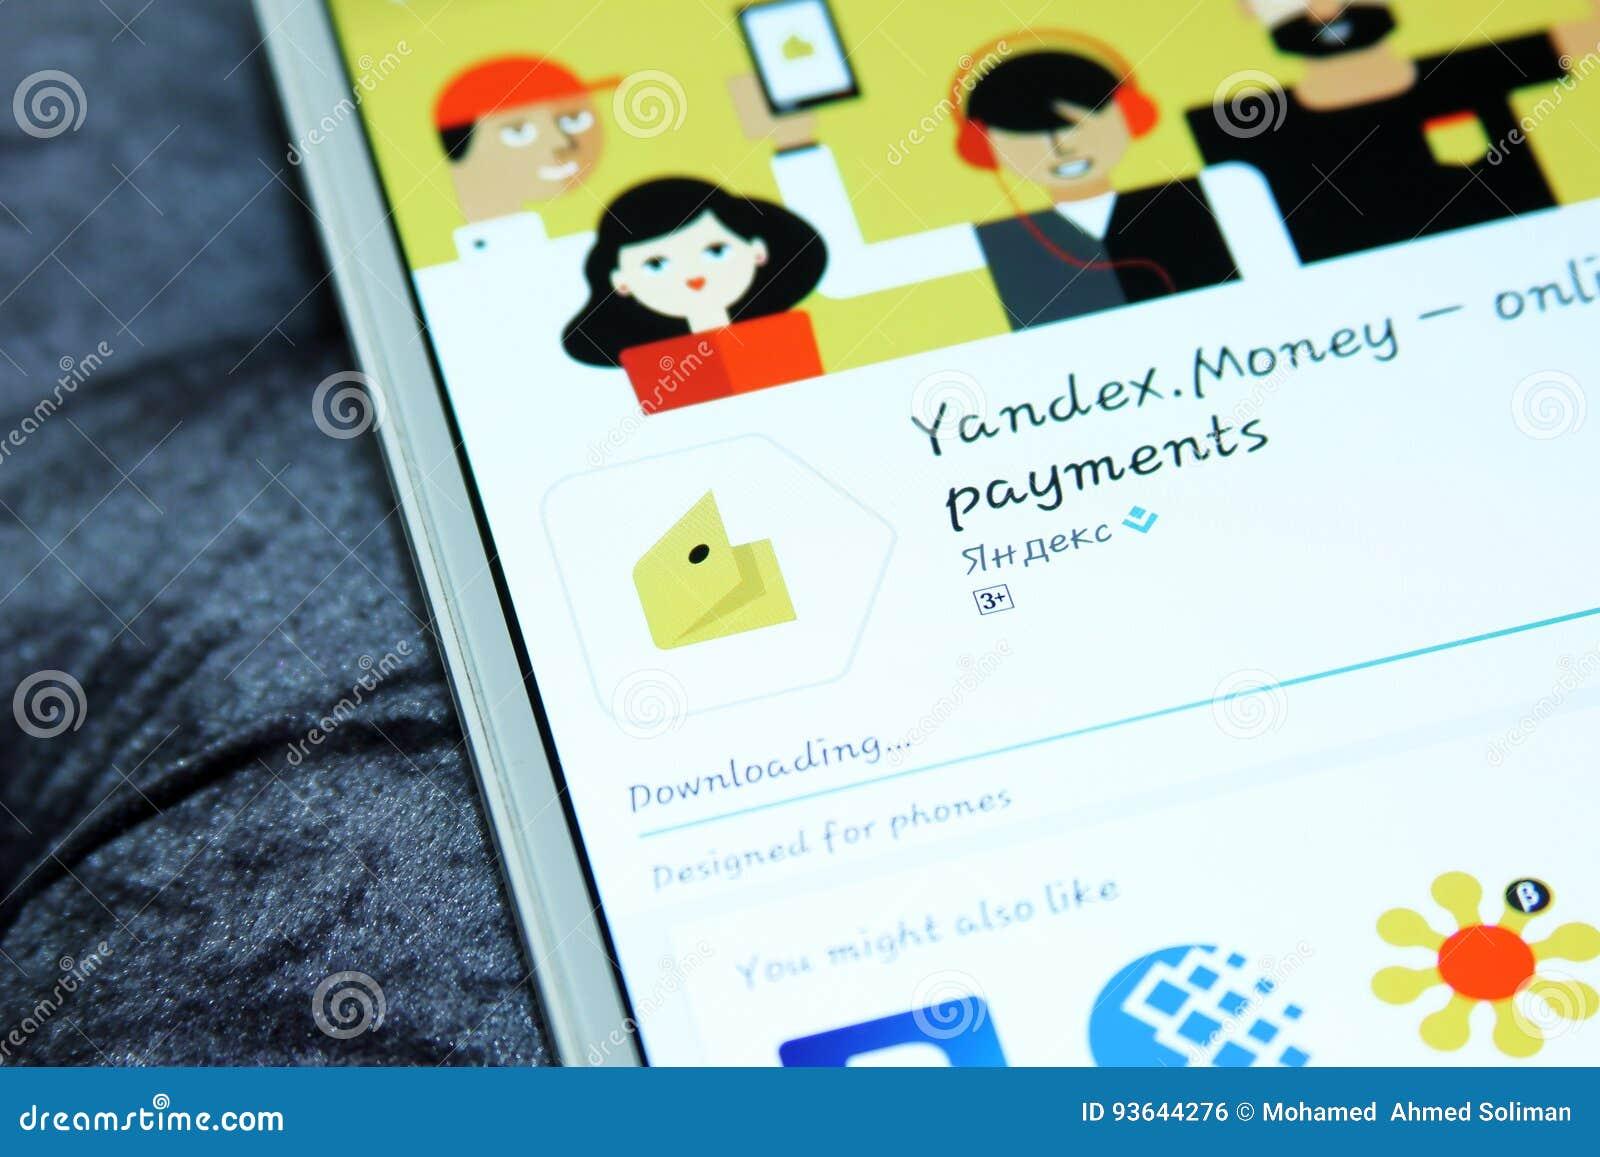 Yandex money mobile app editorial photo  Image of mobile